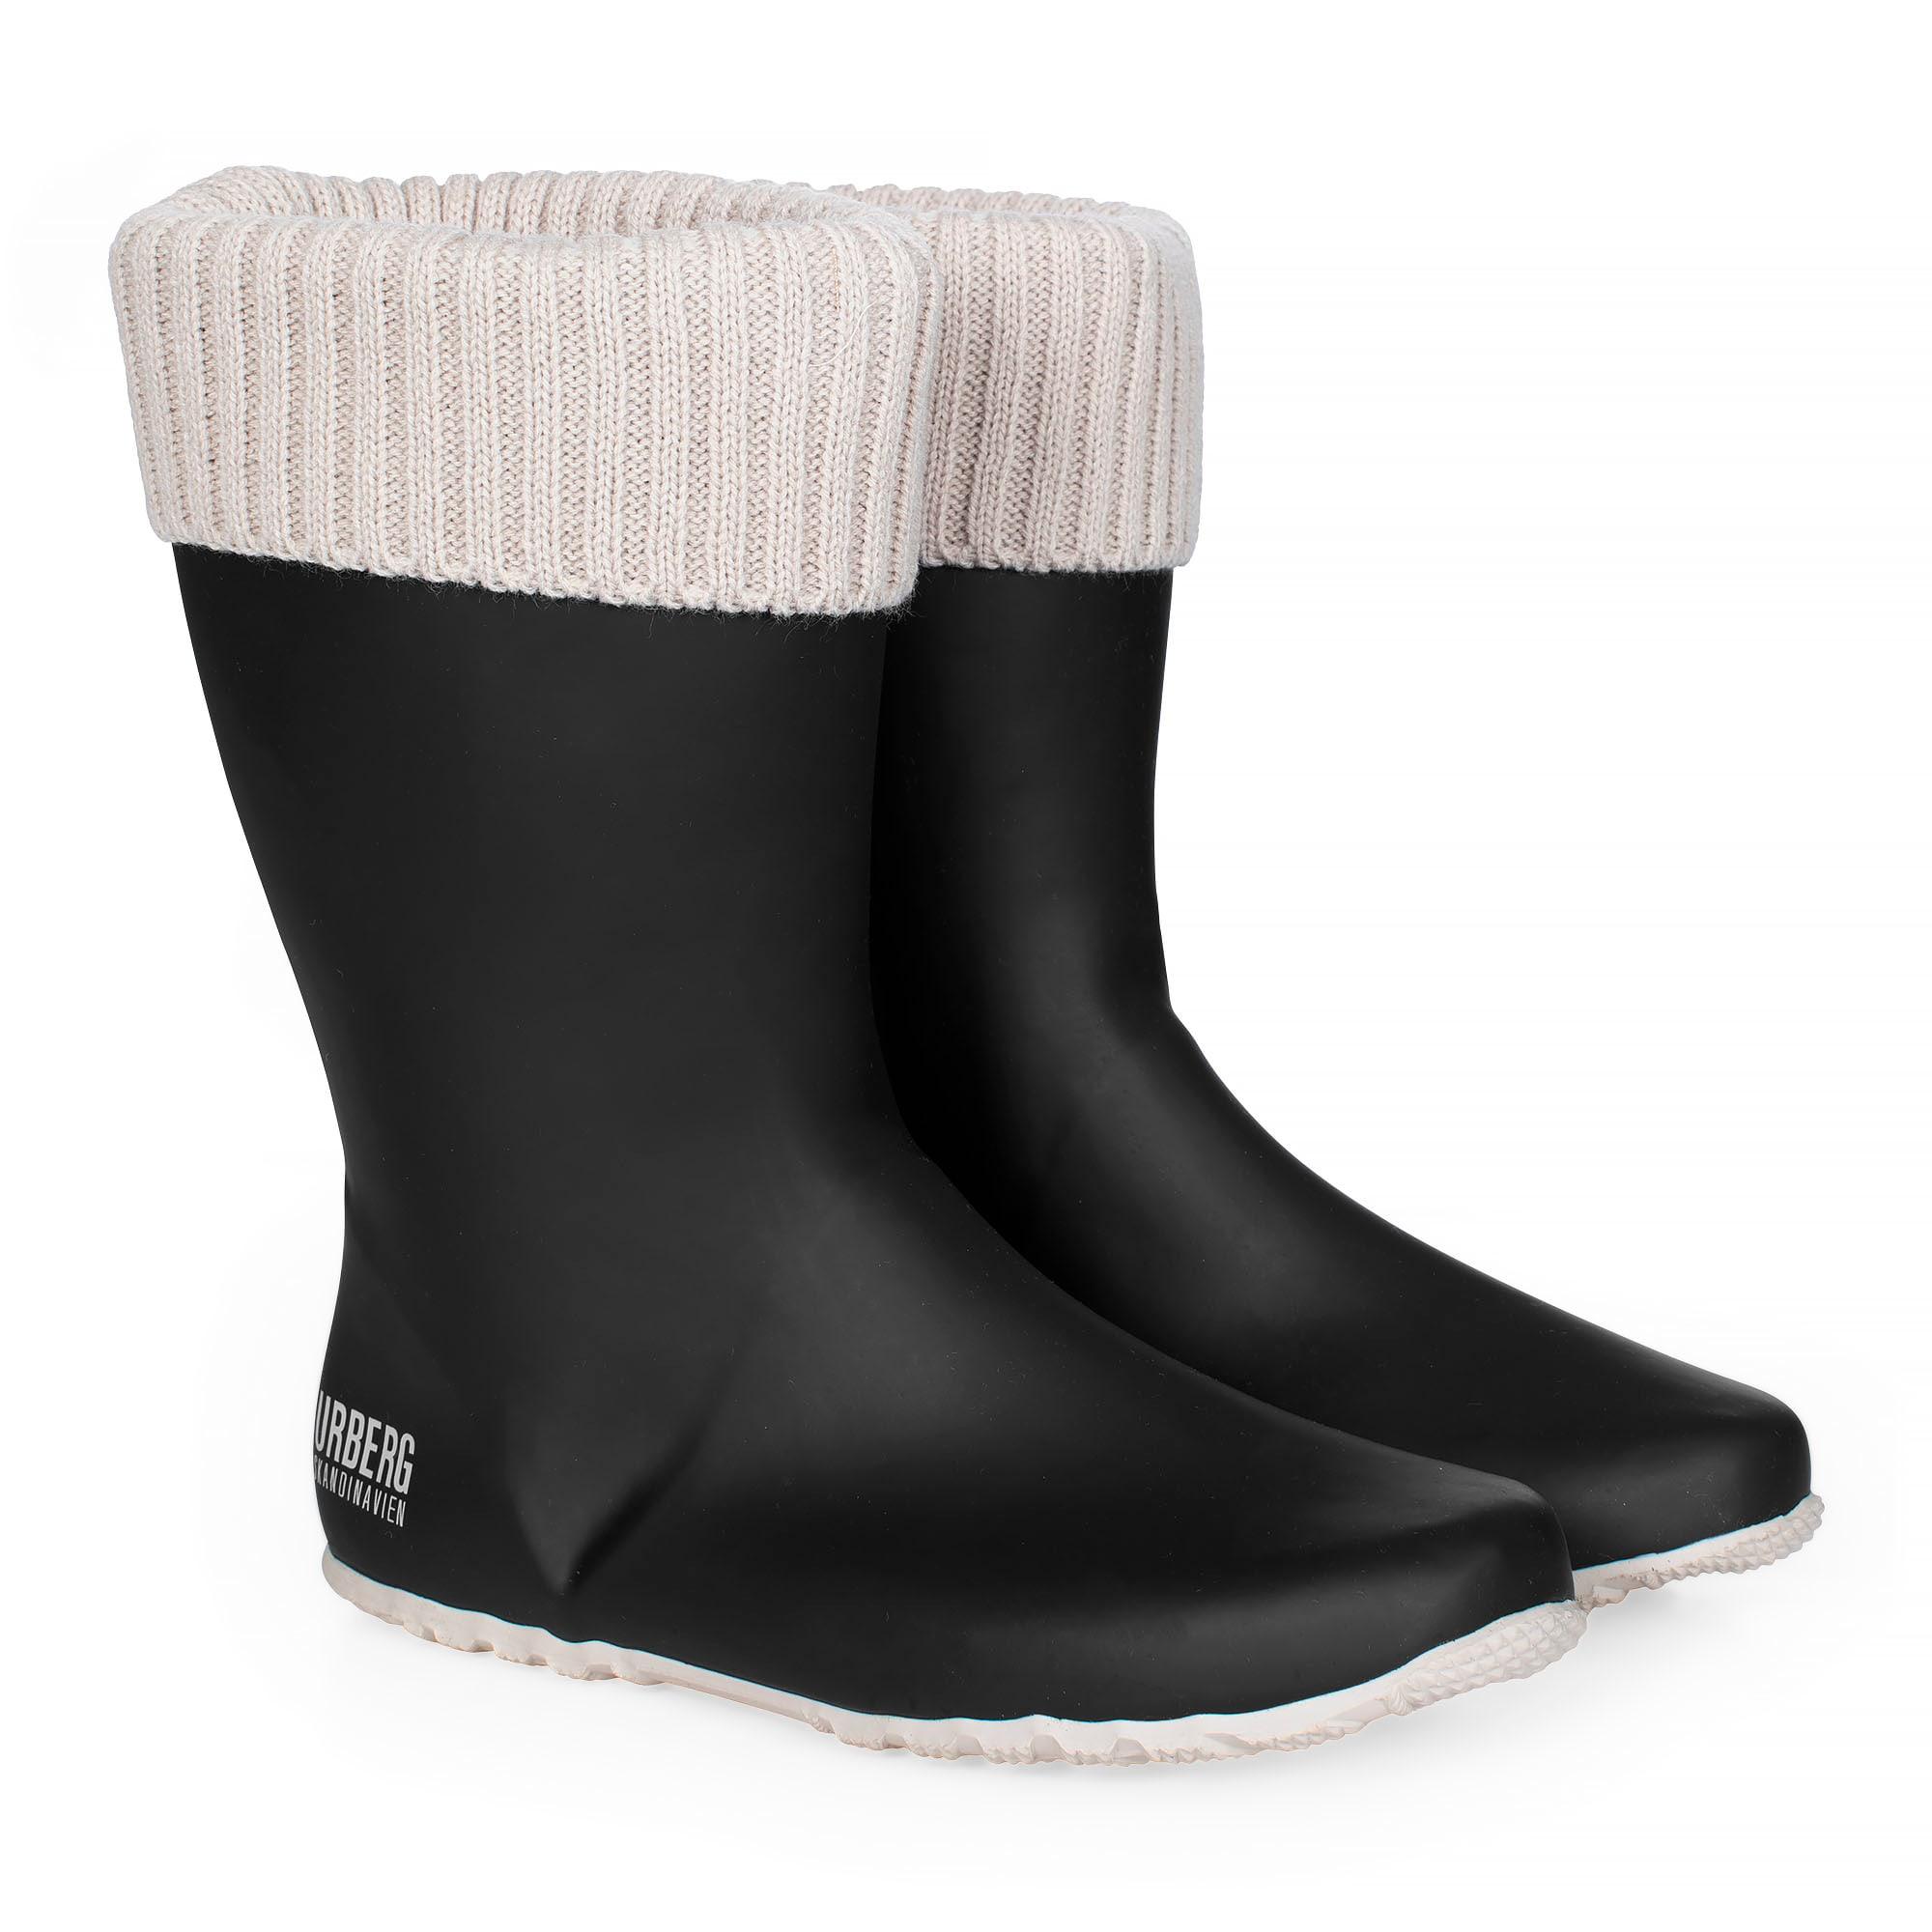 Köp Urberg Women's Lysekil Boot hos Outnorth